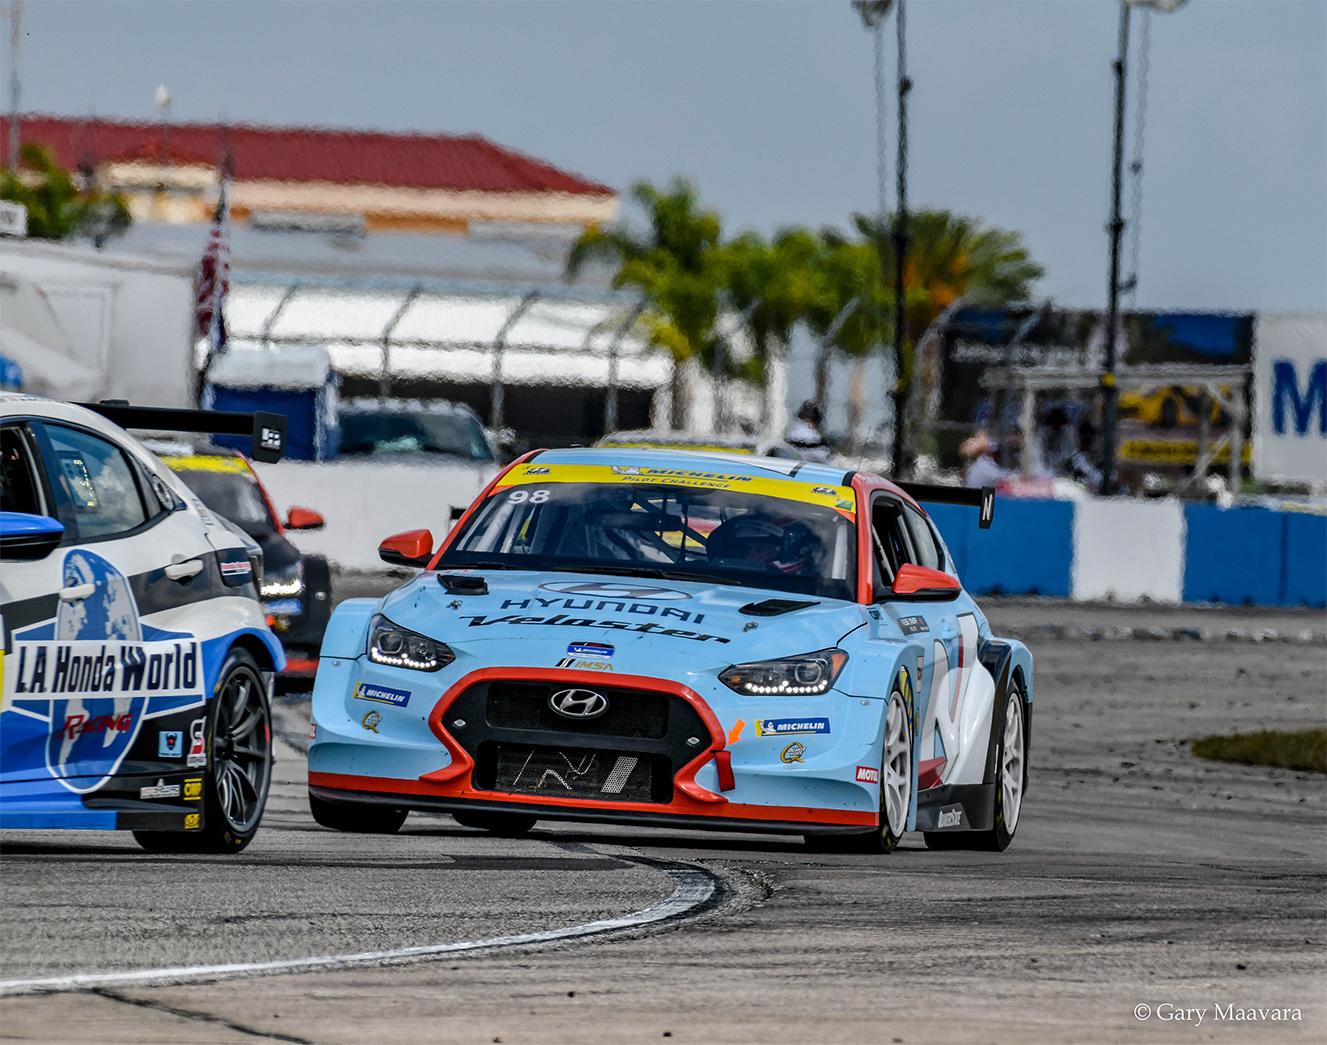 TrackWorthy - Michelin_race_#98_Hyundai Velostar enters turn 16